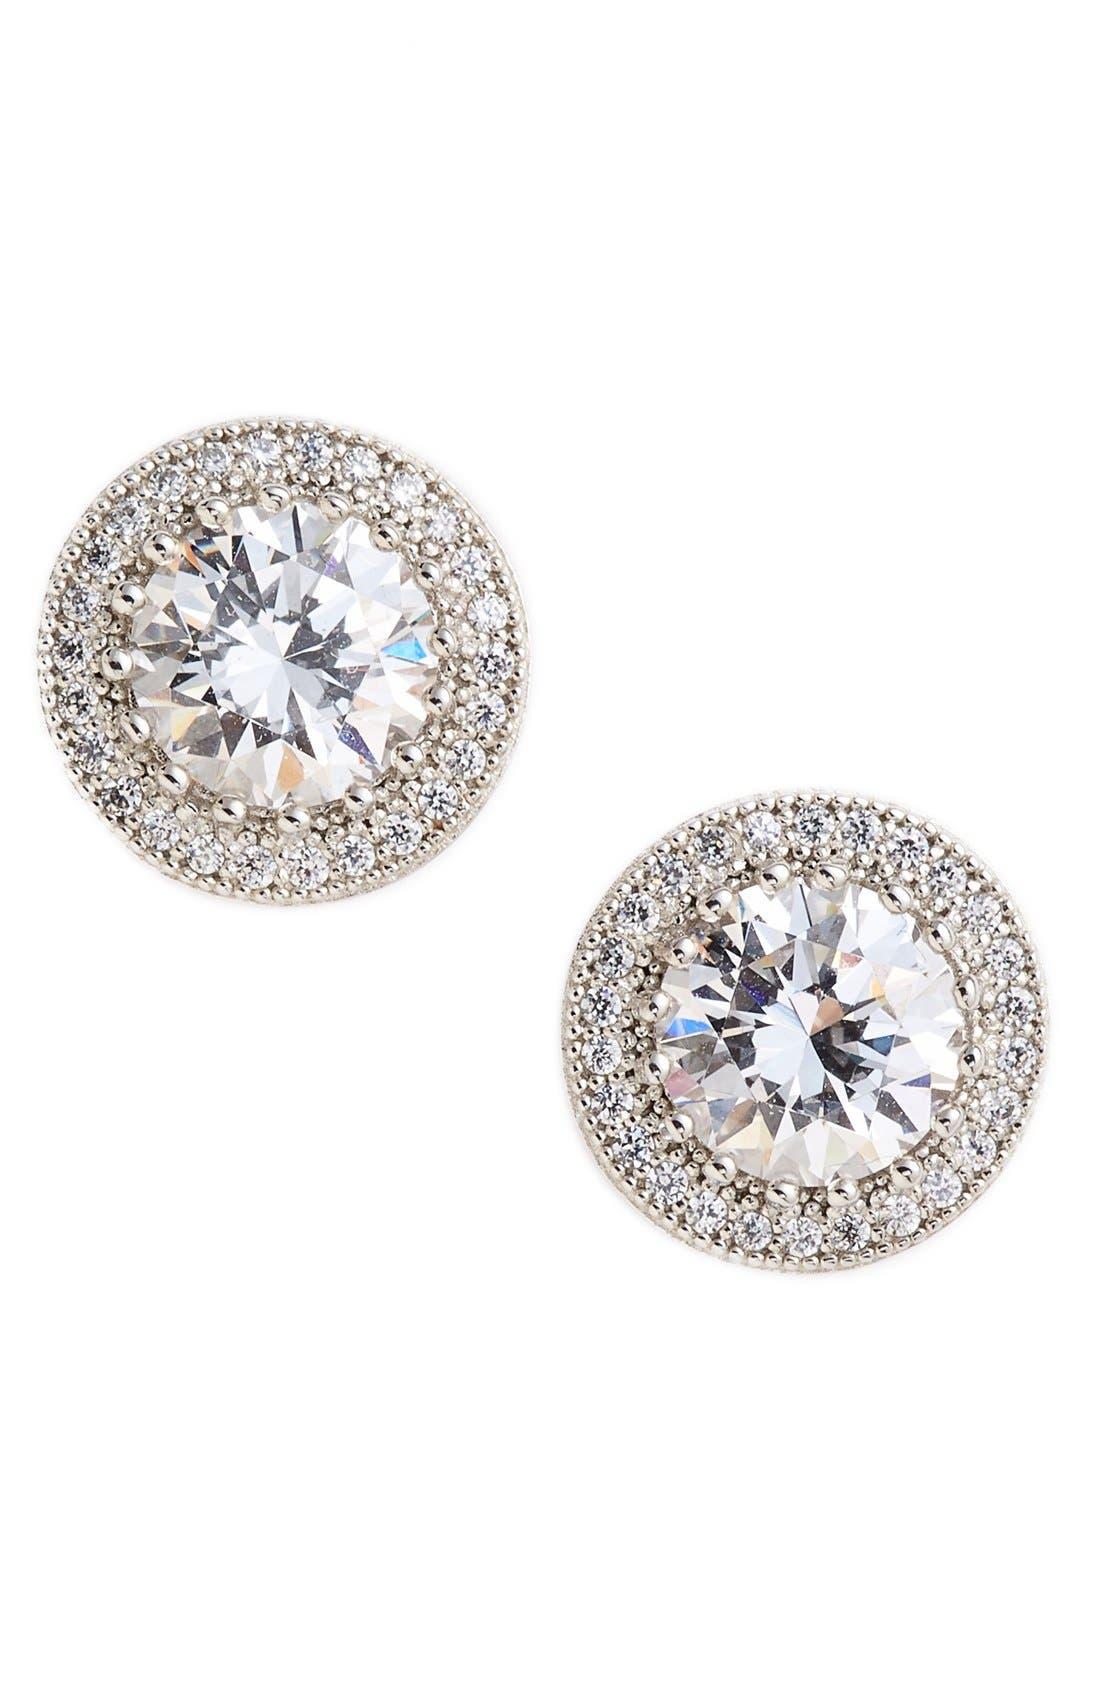 'Lassaire' Stud Earrings,                         Main,                         color, Silver/ Clear